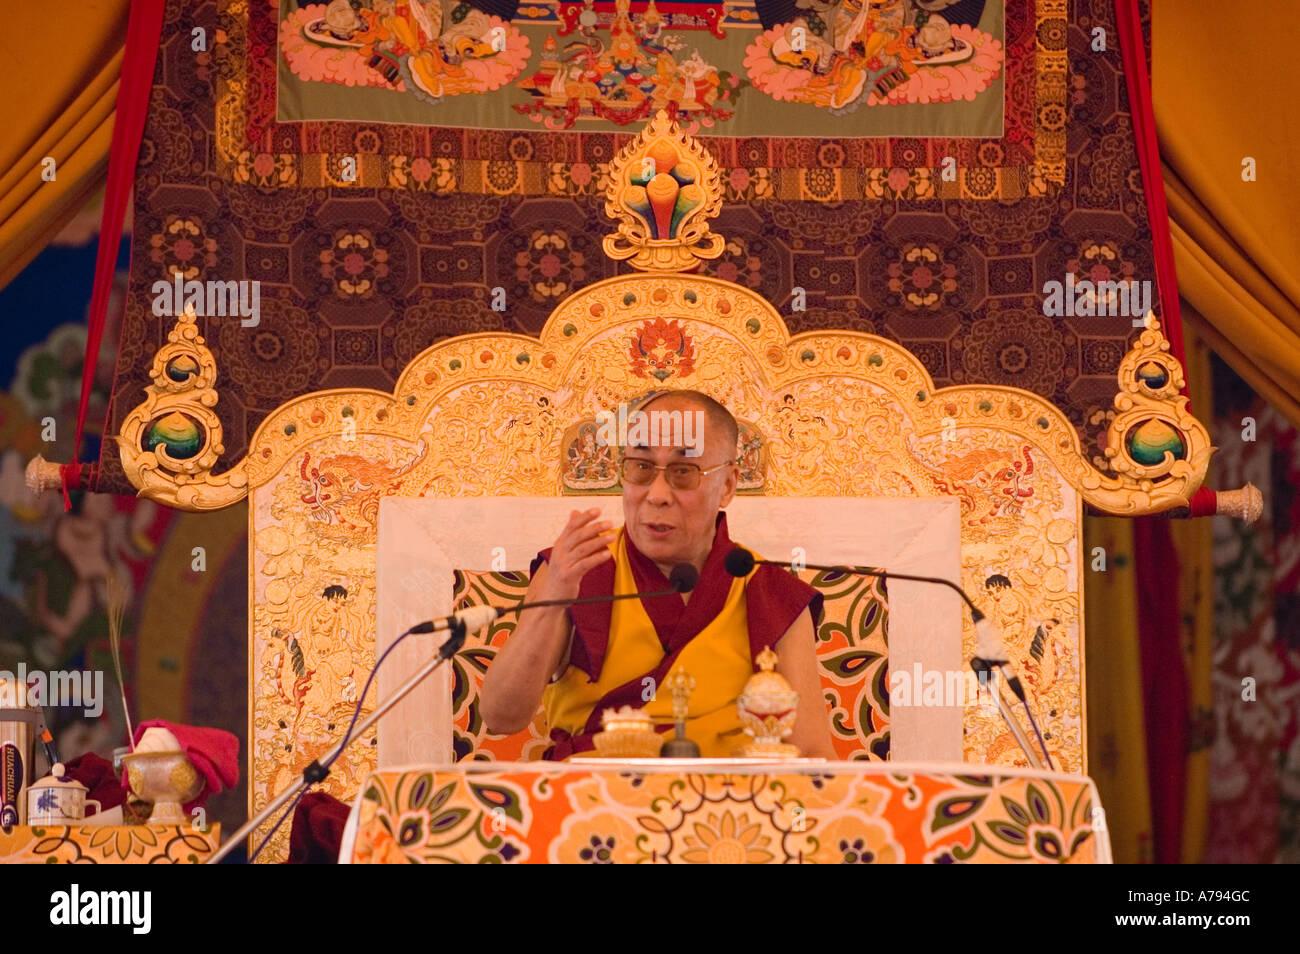 Dalai Lama giving a talk at the Kalachakra ceremony in Amaravati India - Stock Image